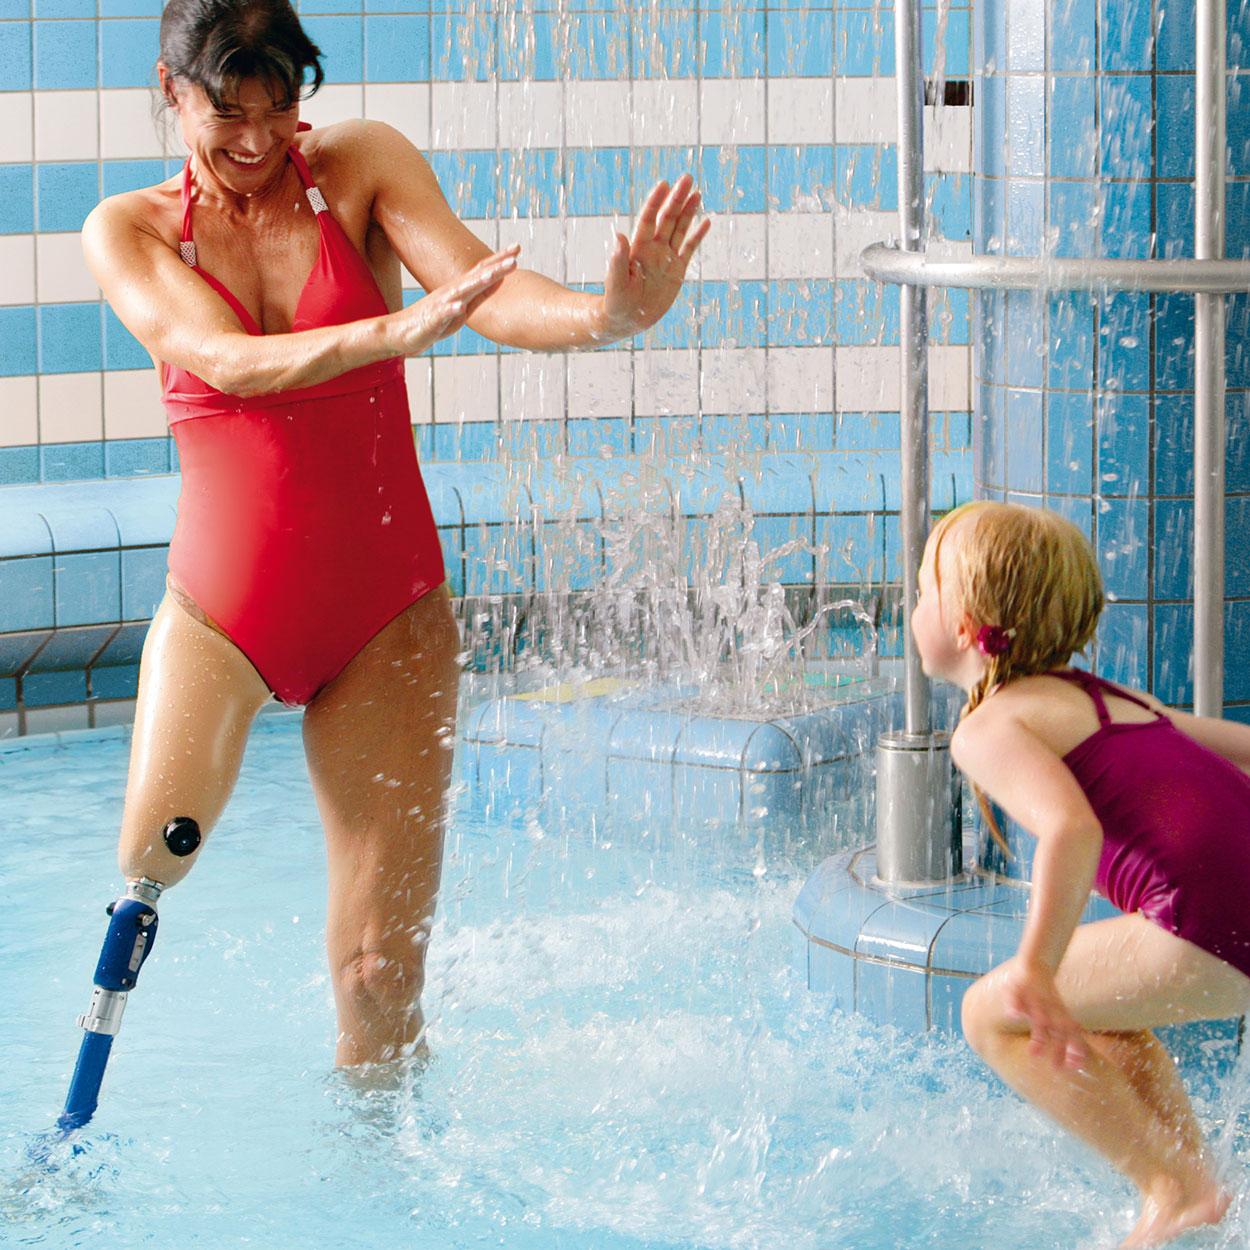 northeast-orthotics-and-prosthetics-ri-prosthetic-leg-in-water.jpg